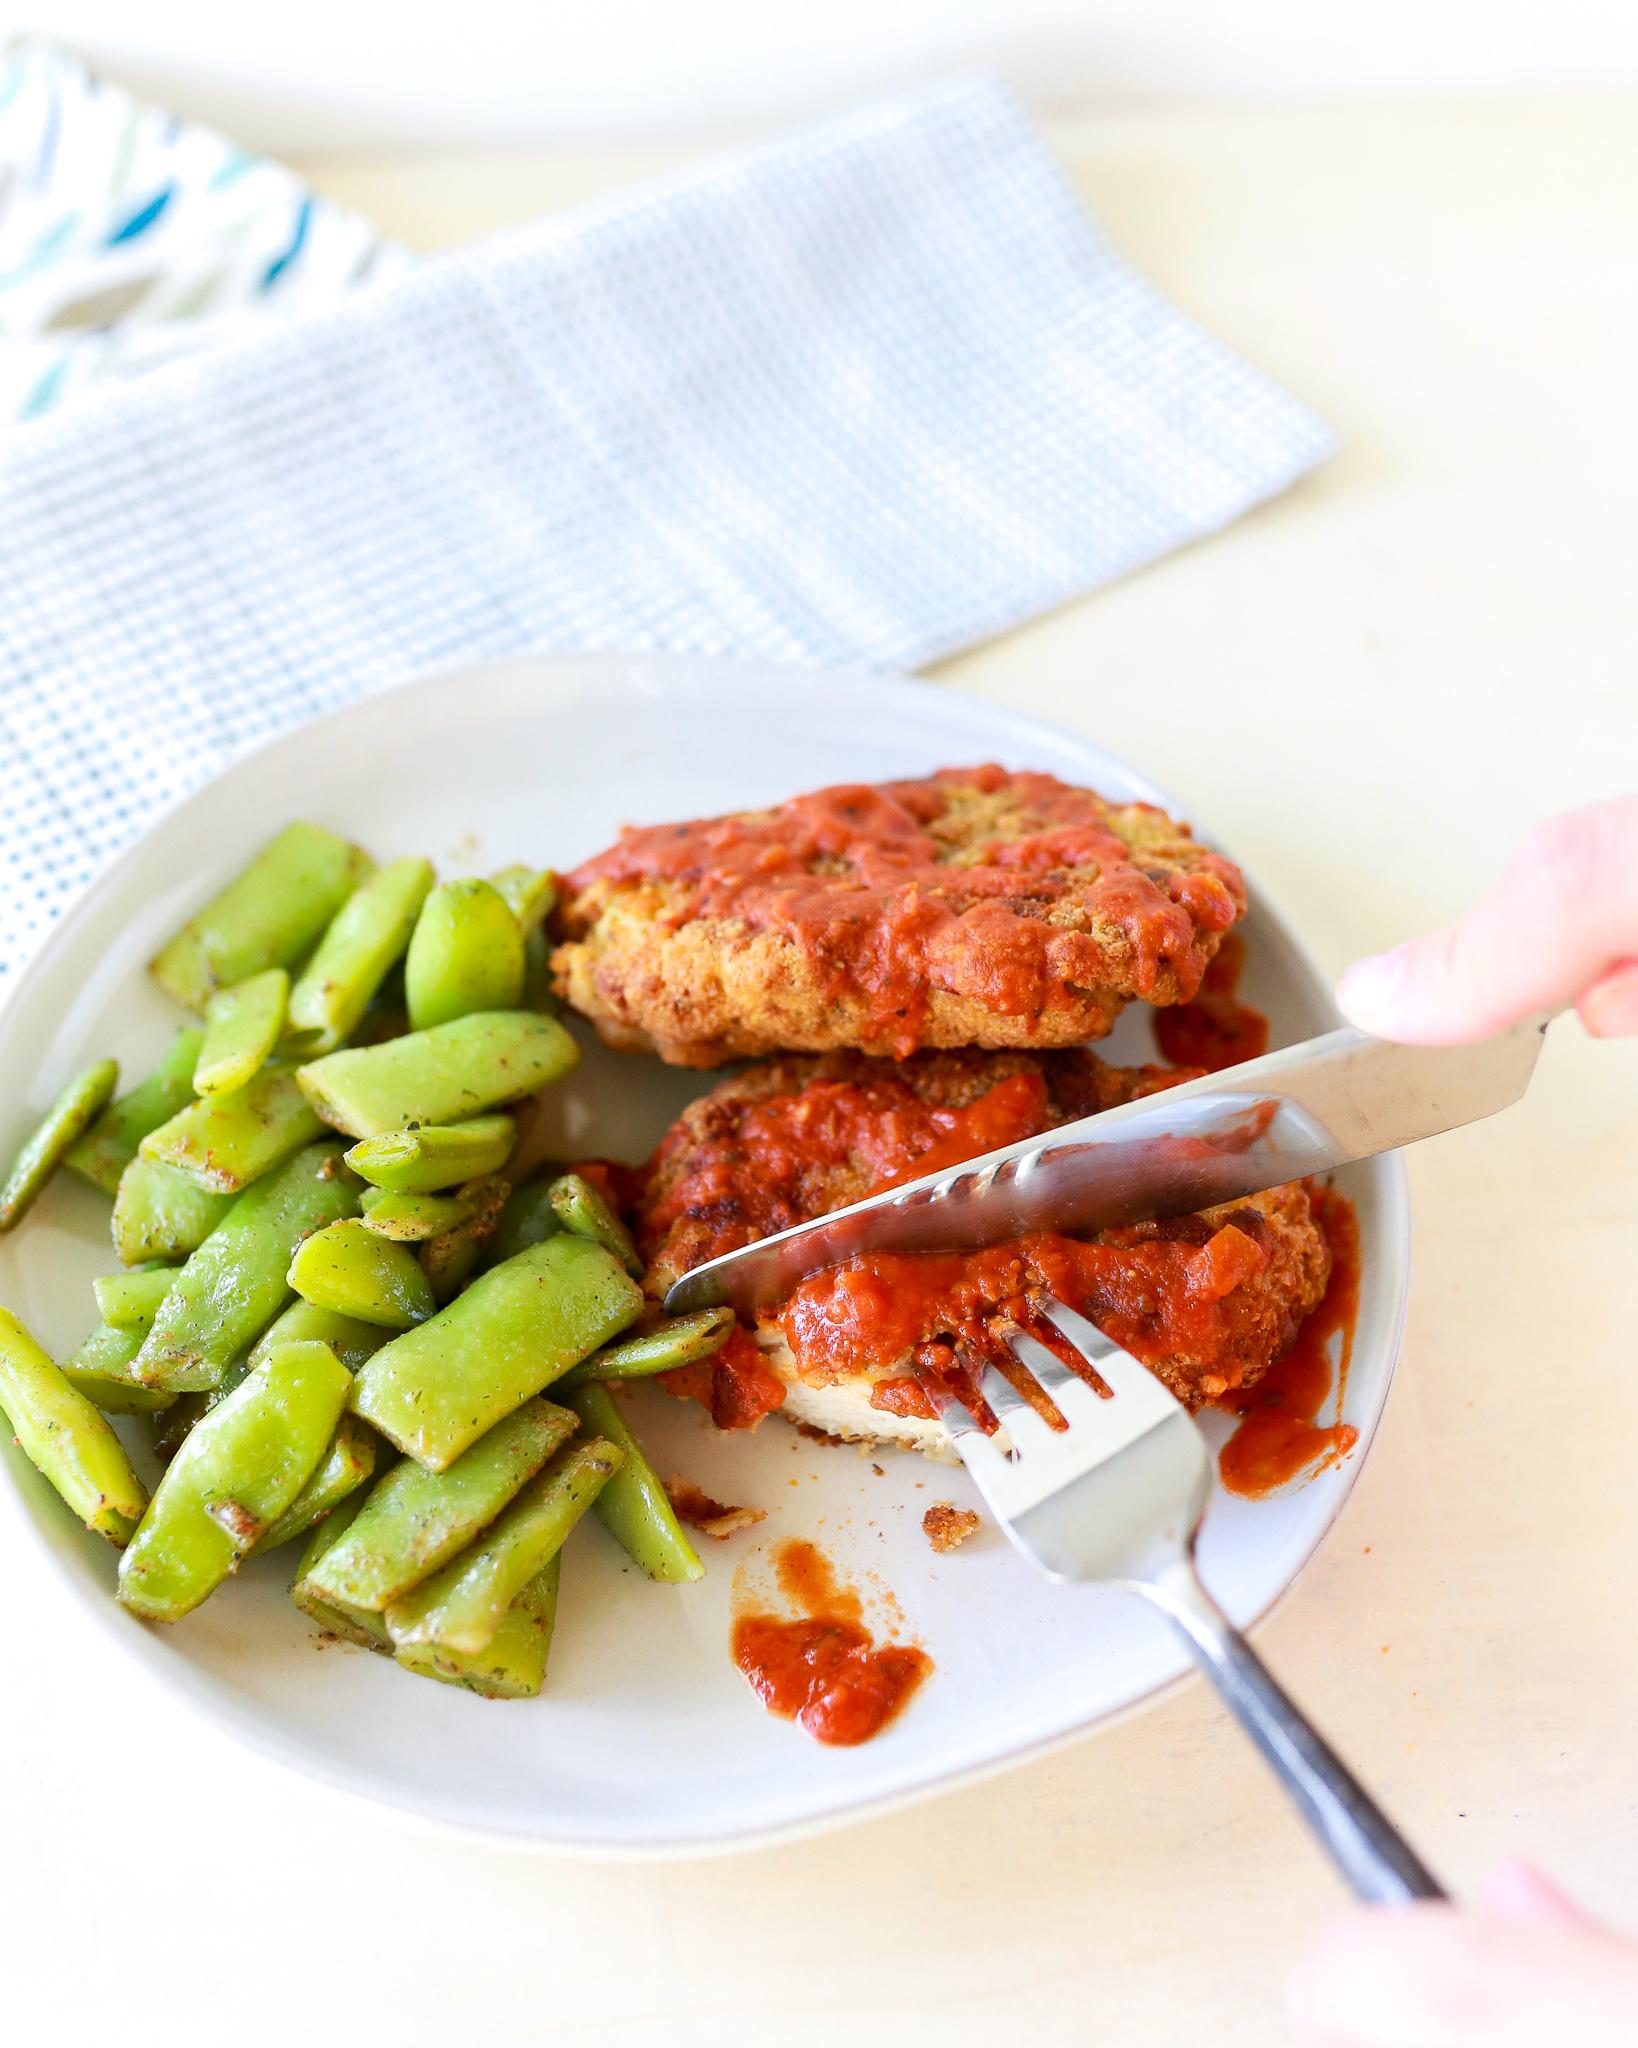 Crispy delicious chicken pomodoro